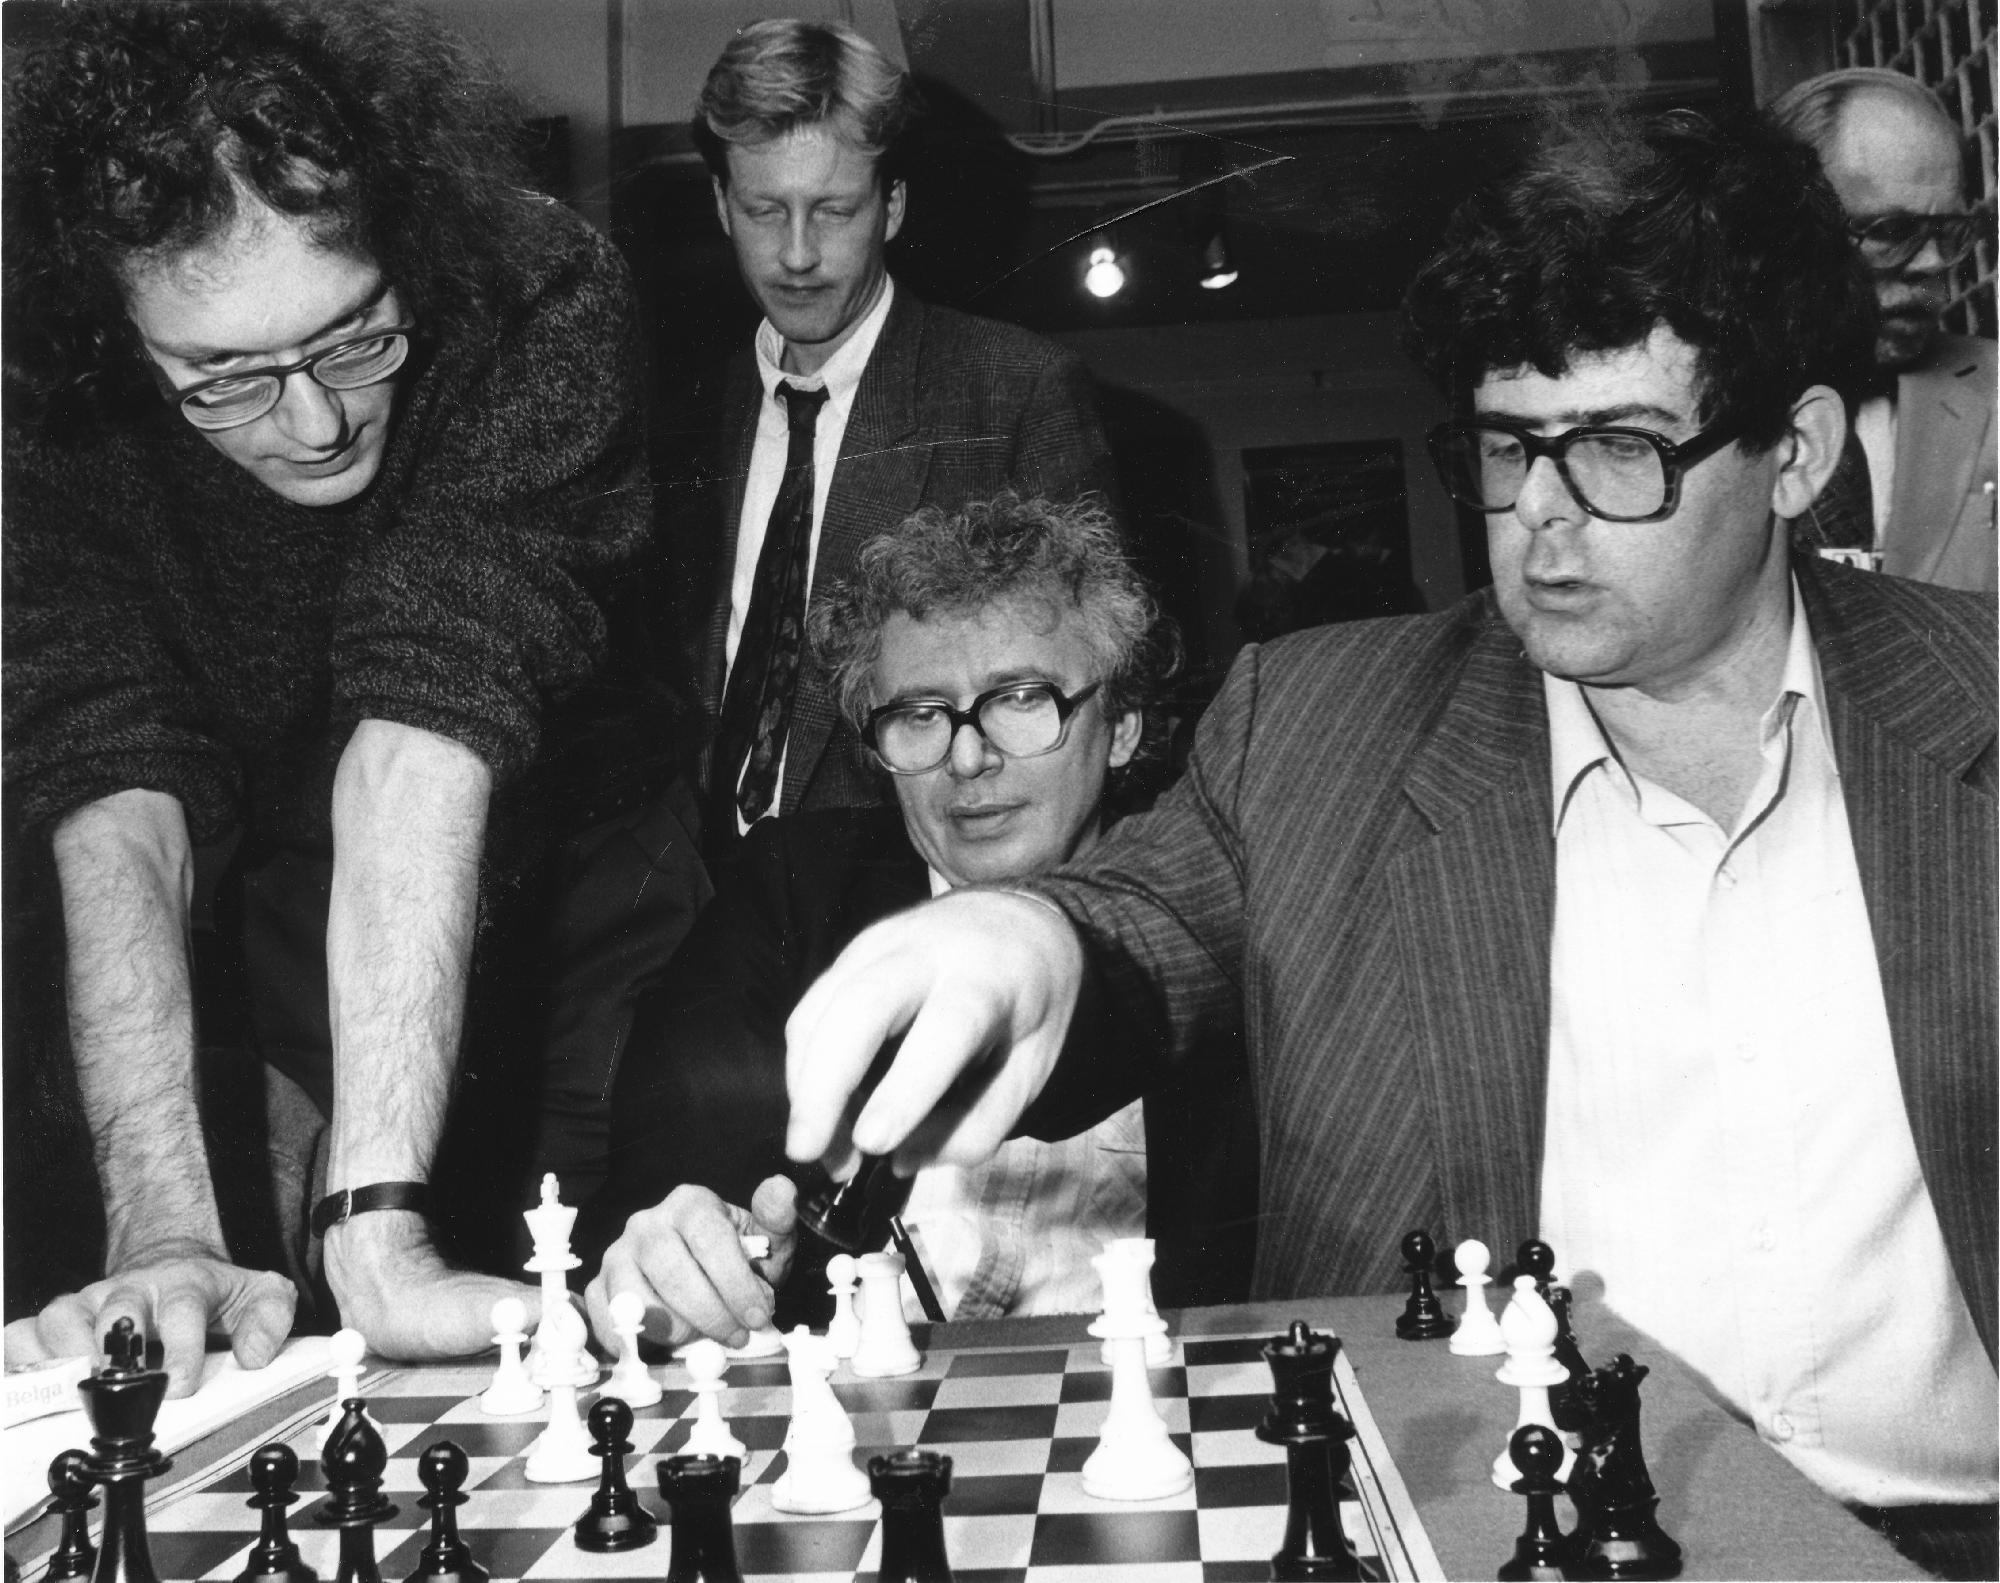 IM Mark Izrailovich Dvoretsky holding forth with Jonathan Speelman, Jonathan Manley., Mihai Suba and Bernard Cafferty. Photograph : Mark Huba